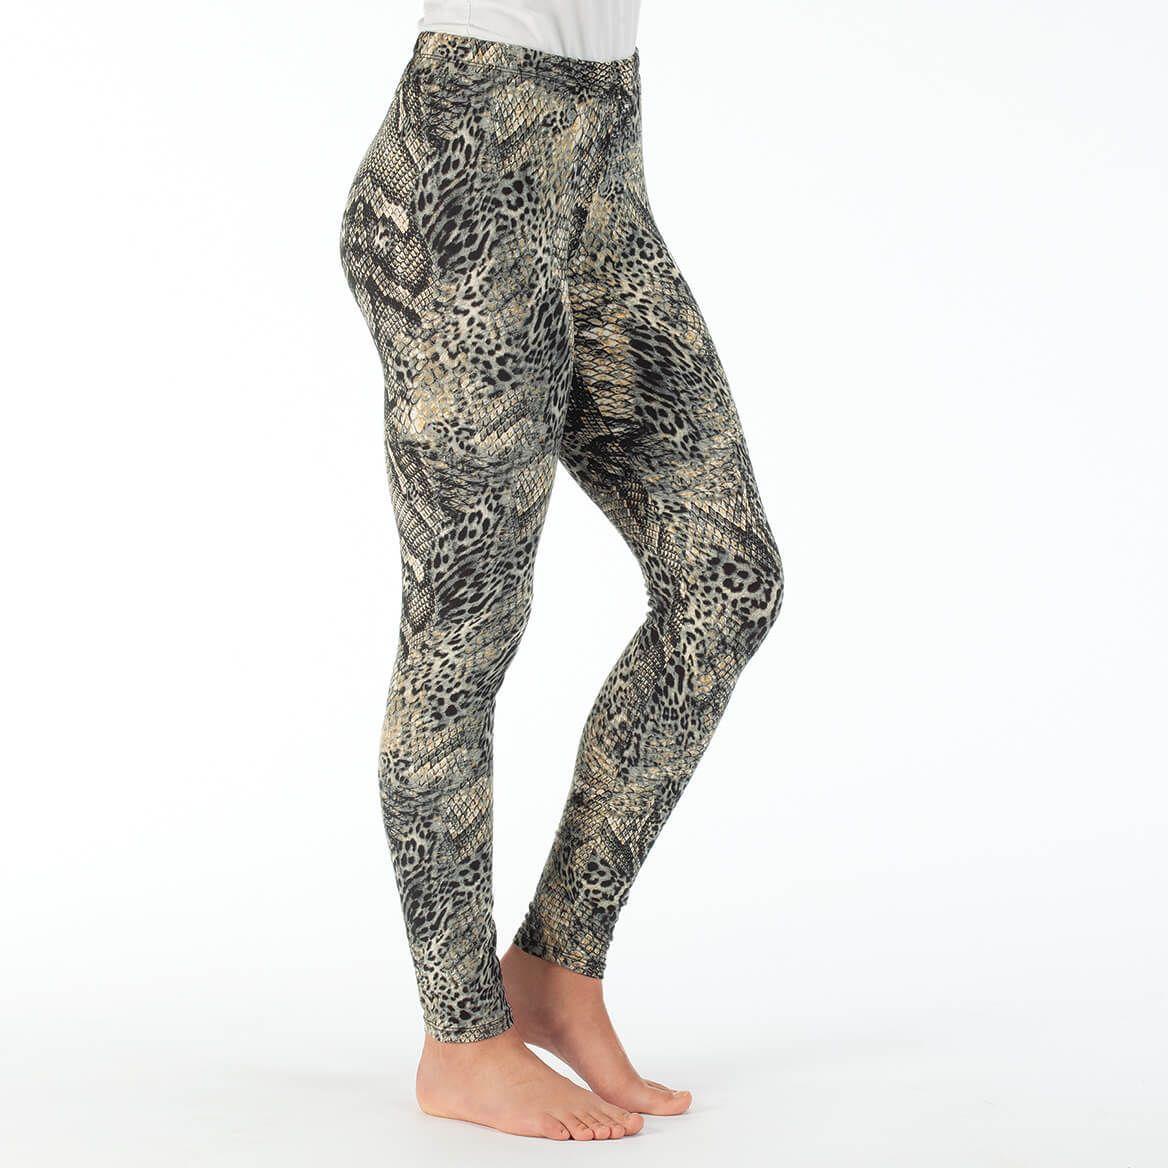 Printed Leggings by Collette Love™-372330